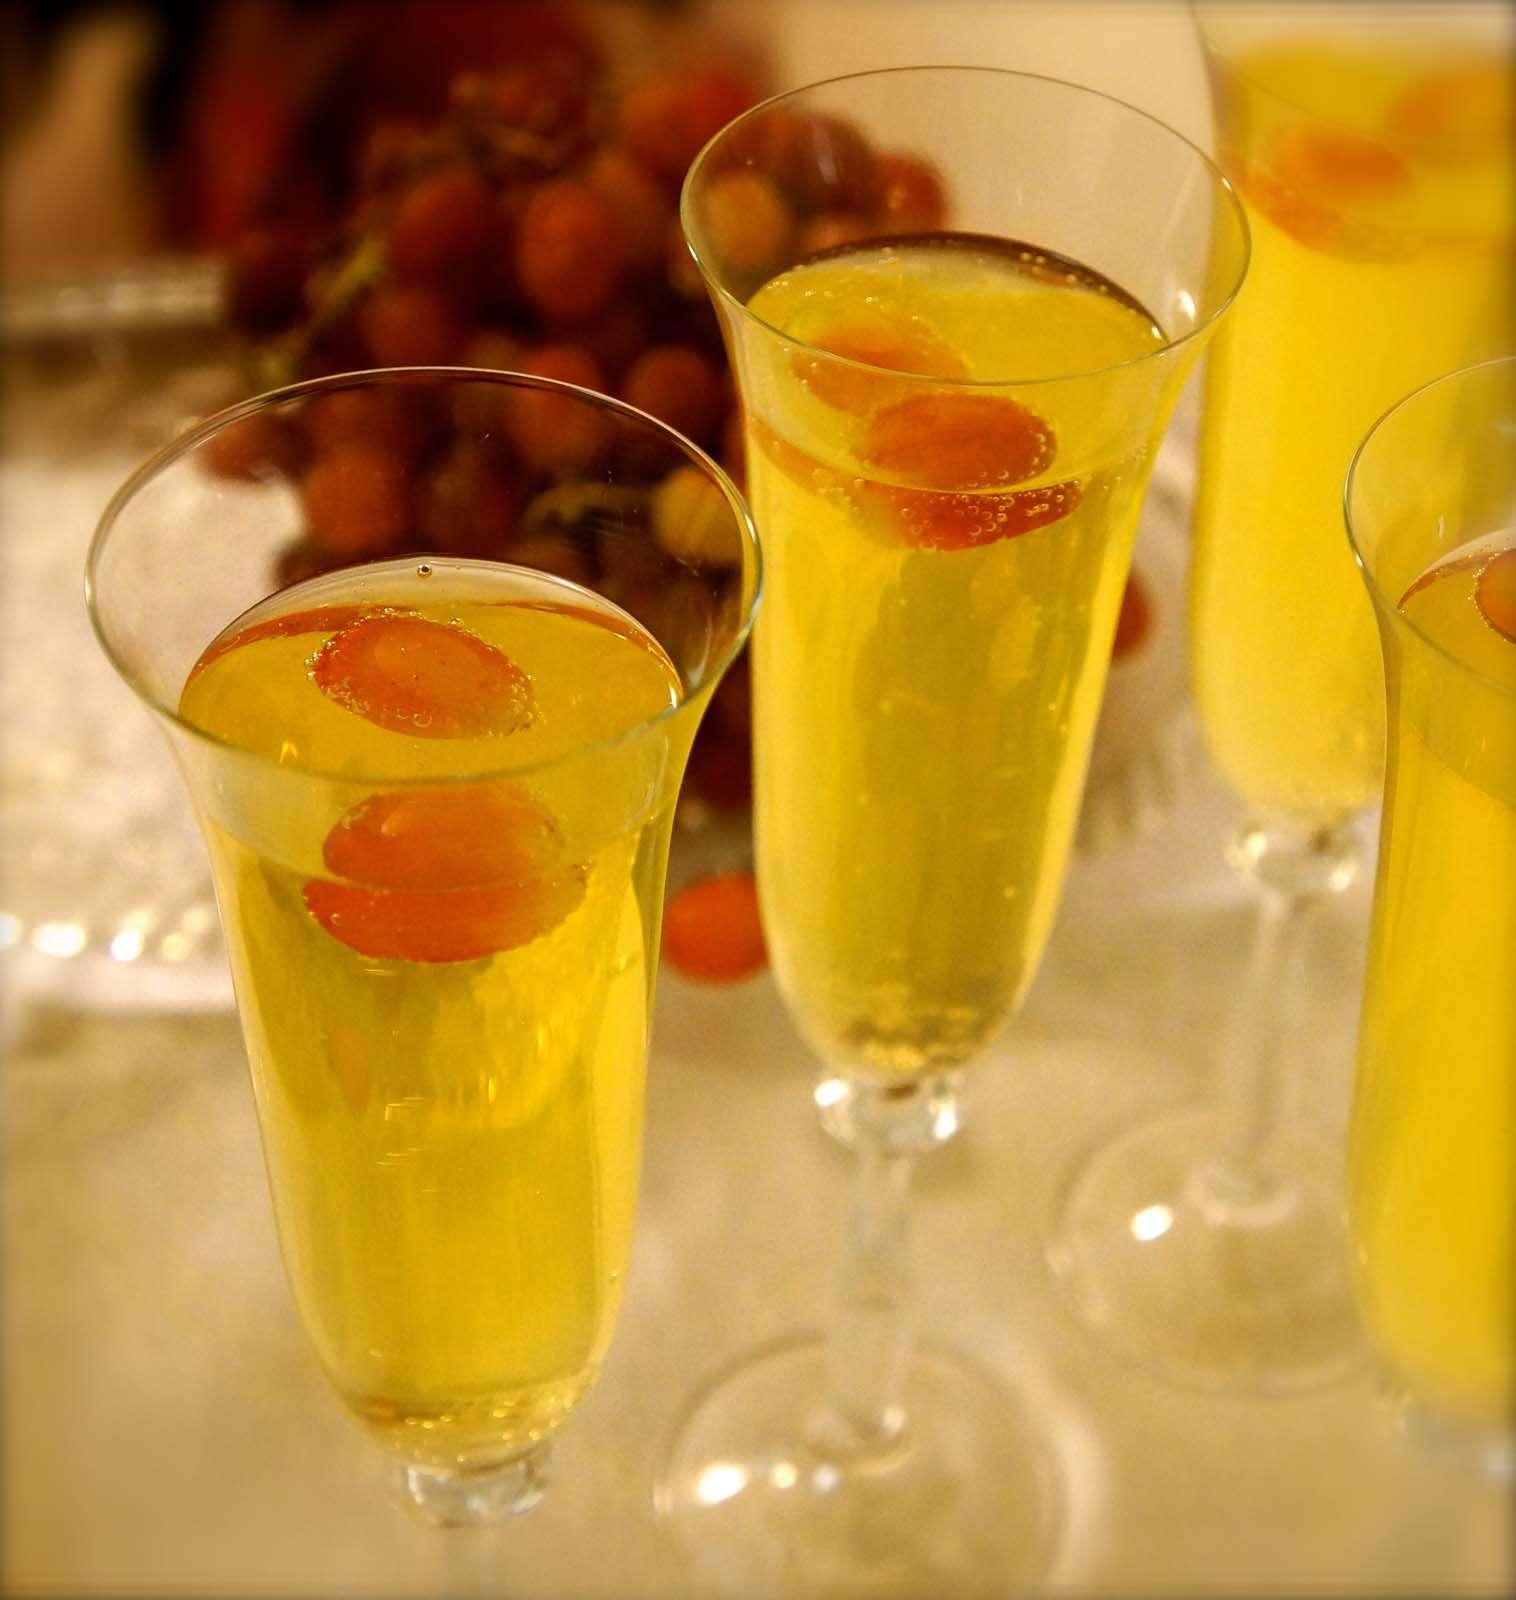 Non-Alcoholic Sparkling White Grape Juice Cocktail